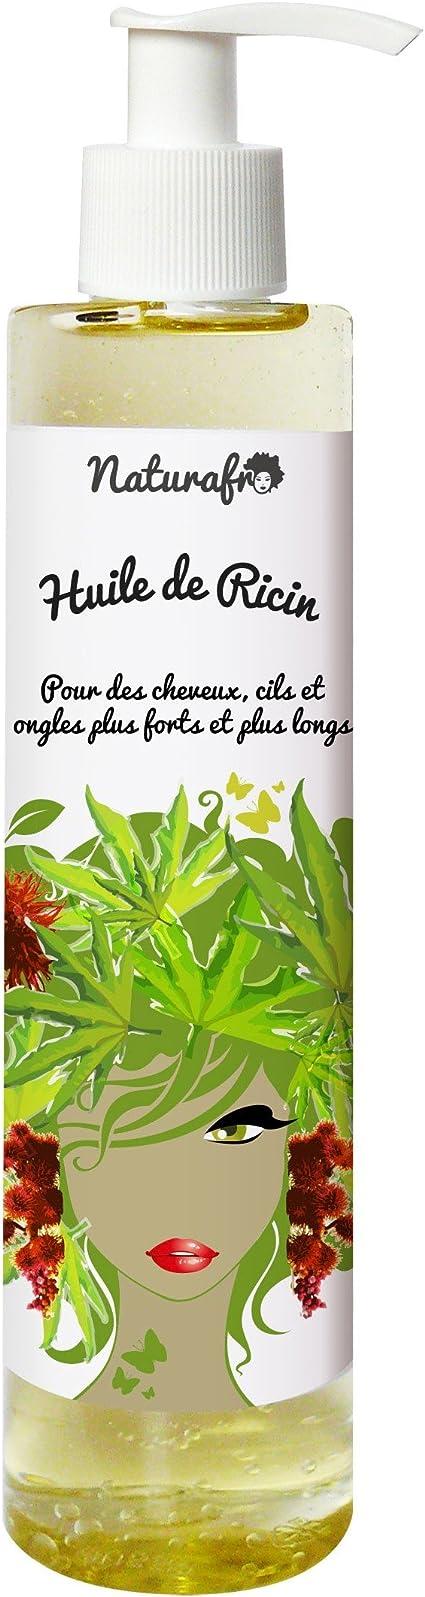 Naturafro - Aceite de ricino para cabello, pestañas y uñas (100 ml): Amazon.es: Belleza